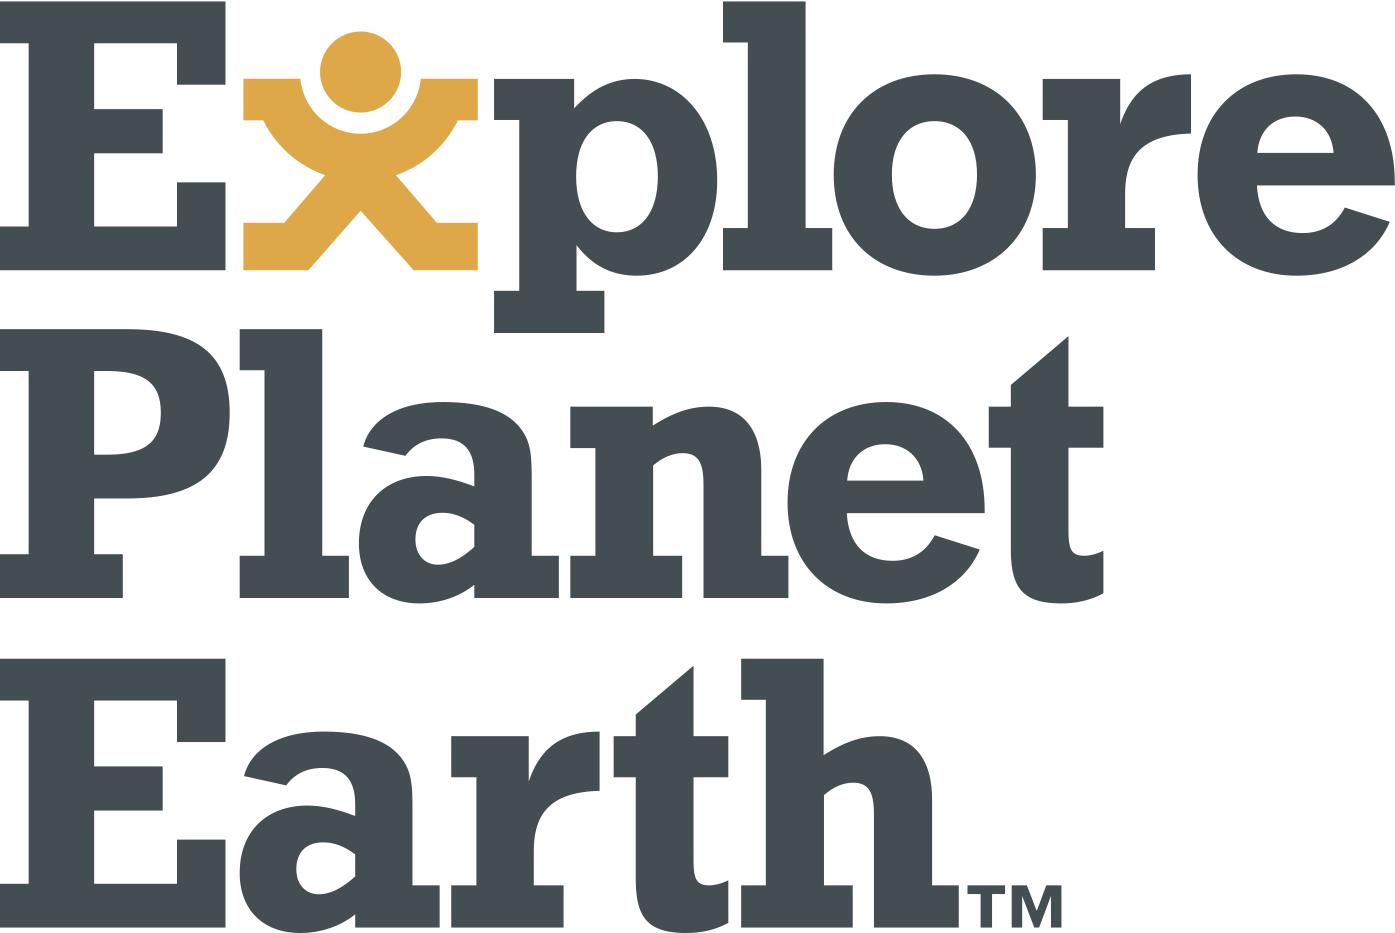 Explore Planet Earth